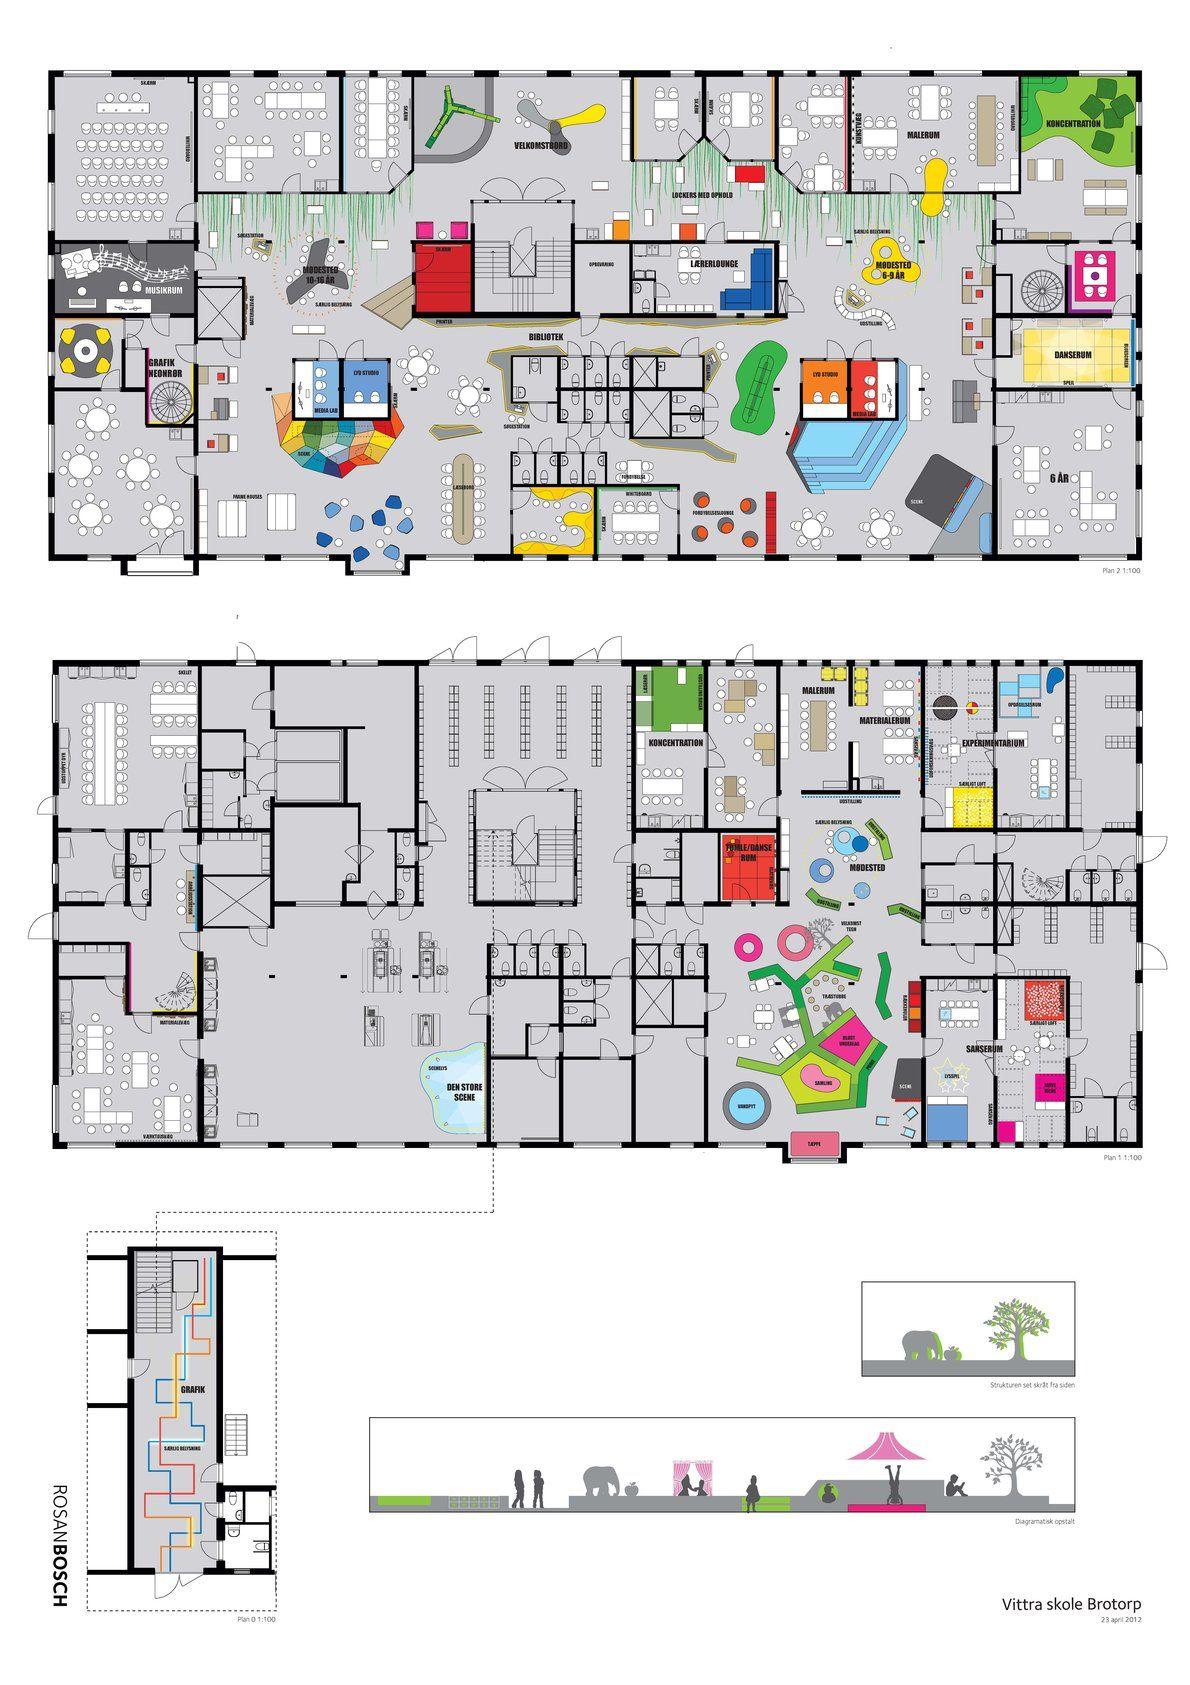 School plan office plan school design floor plans office layouts children health game bosch health care